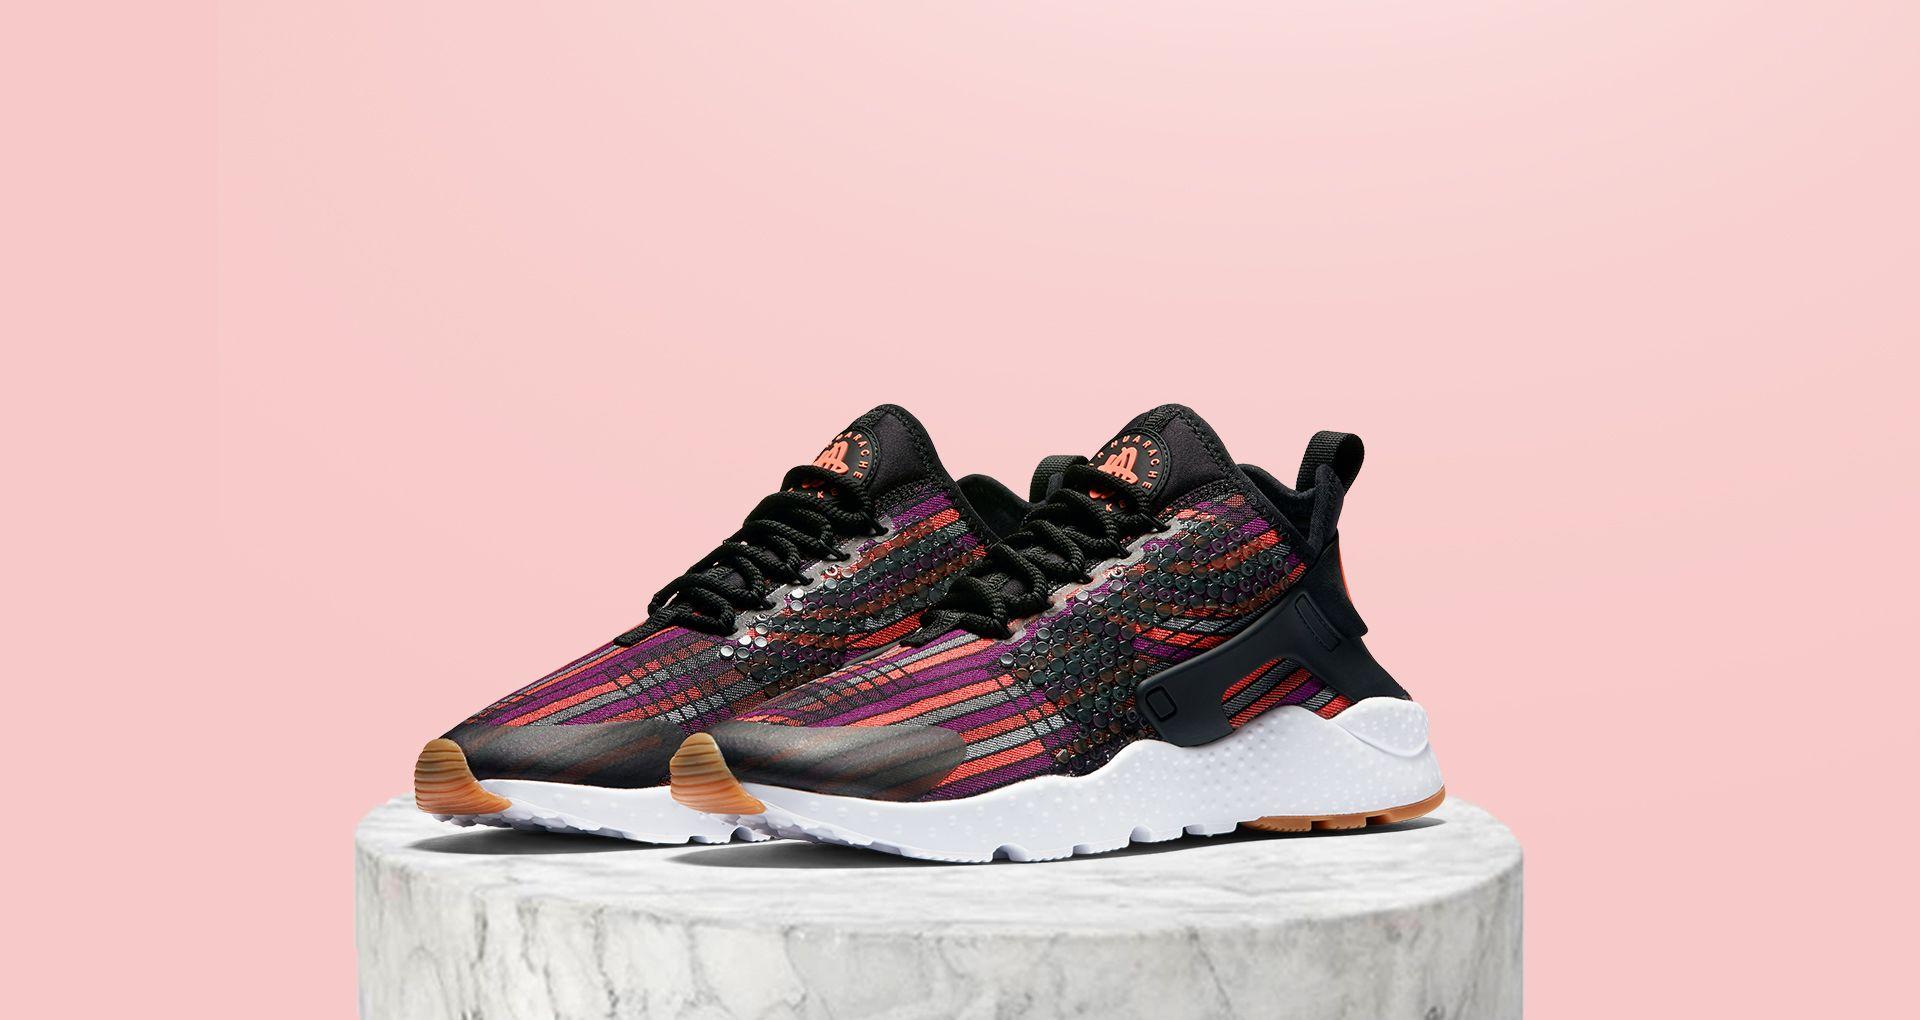 fc27dd0647 Women's Nike Air Huarache Ultra Jacquard Premium 'Hot Lava'. Nike+ ...